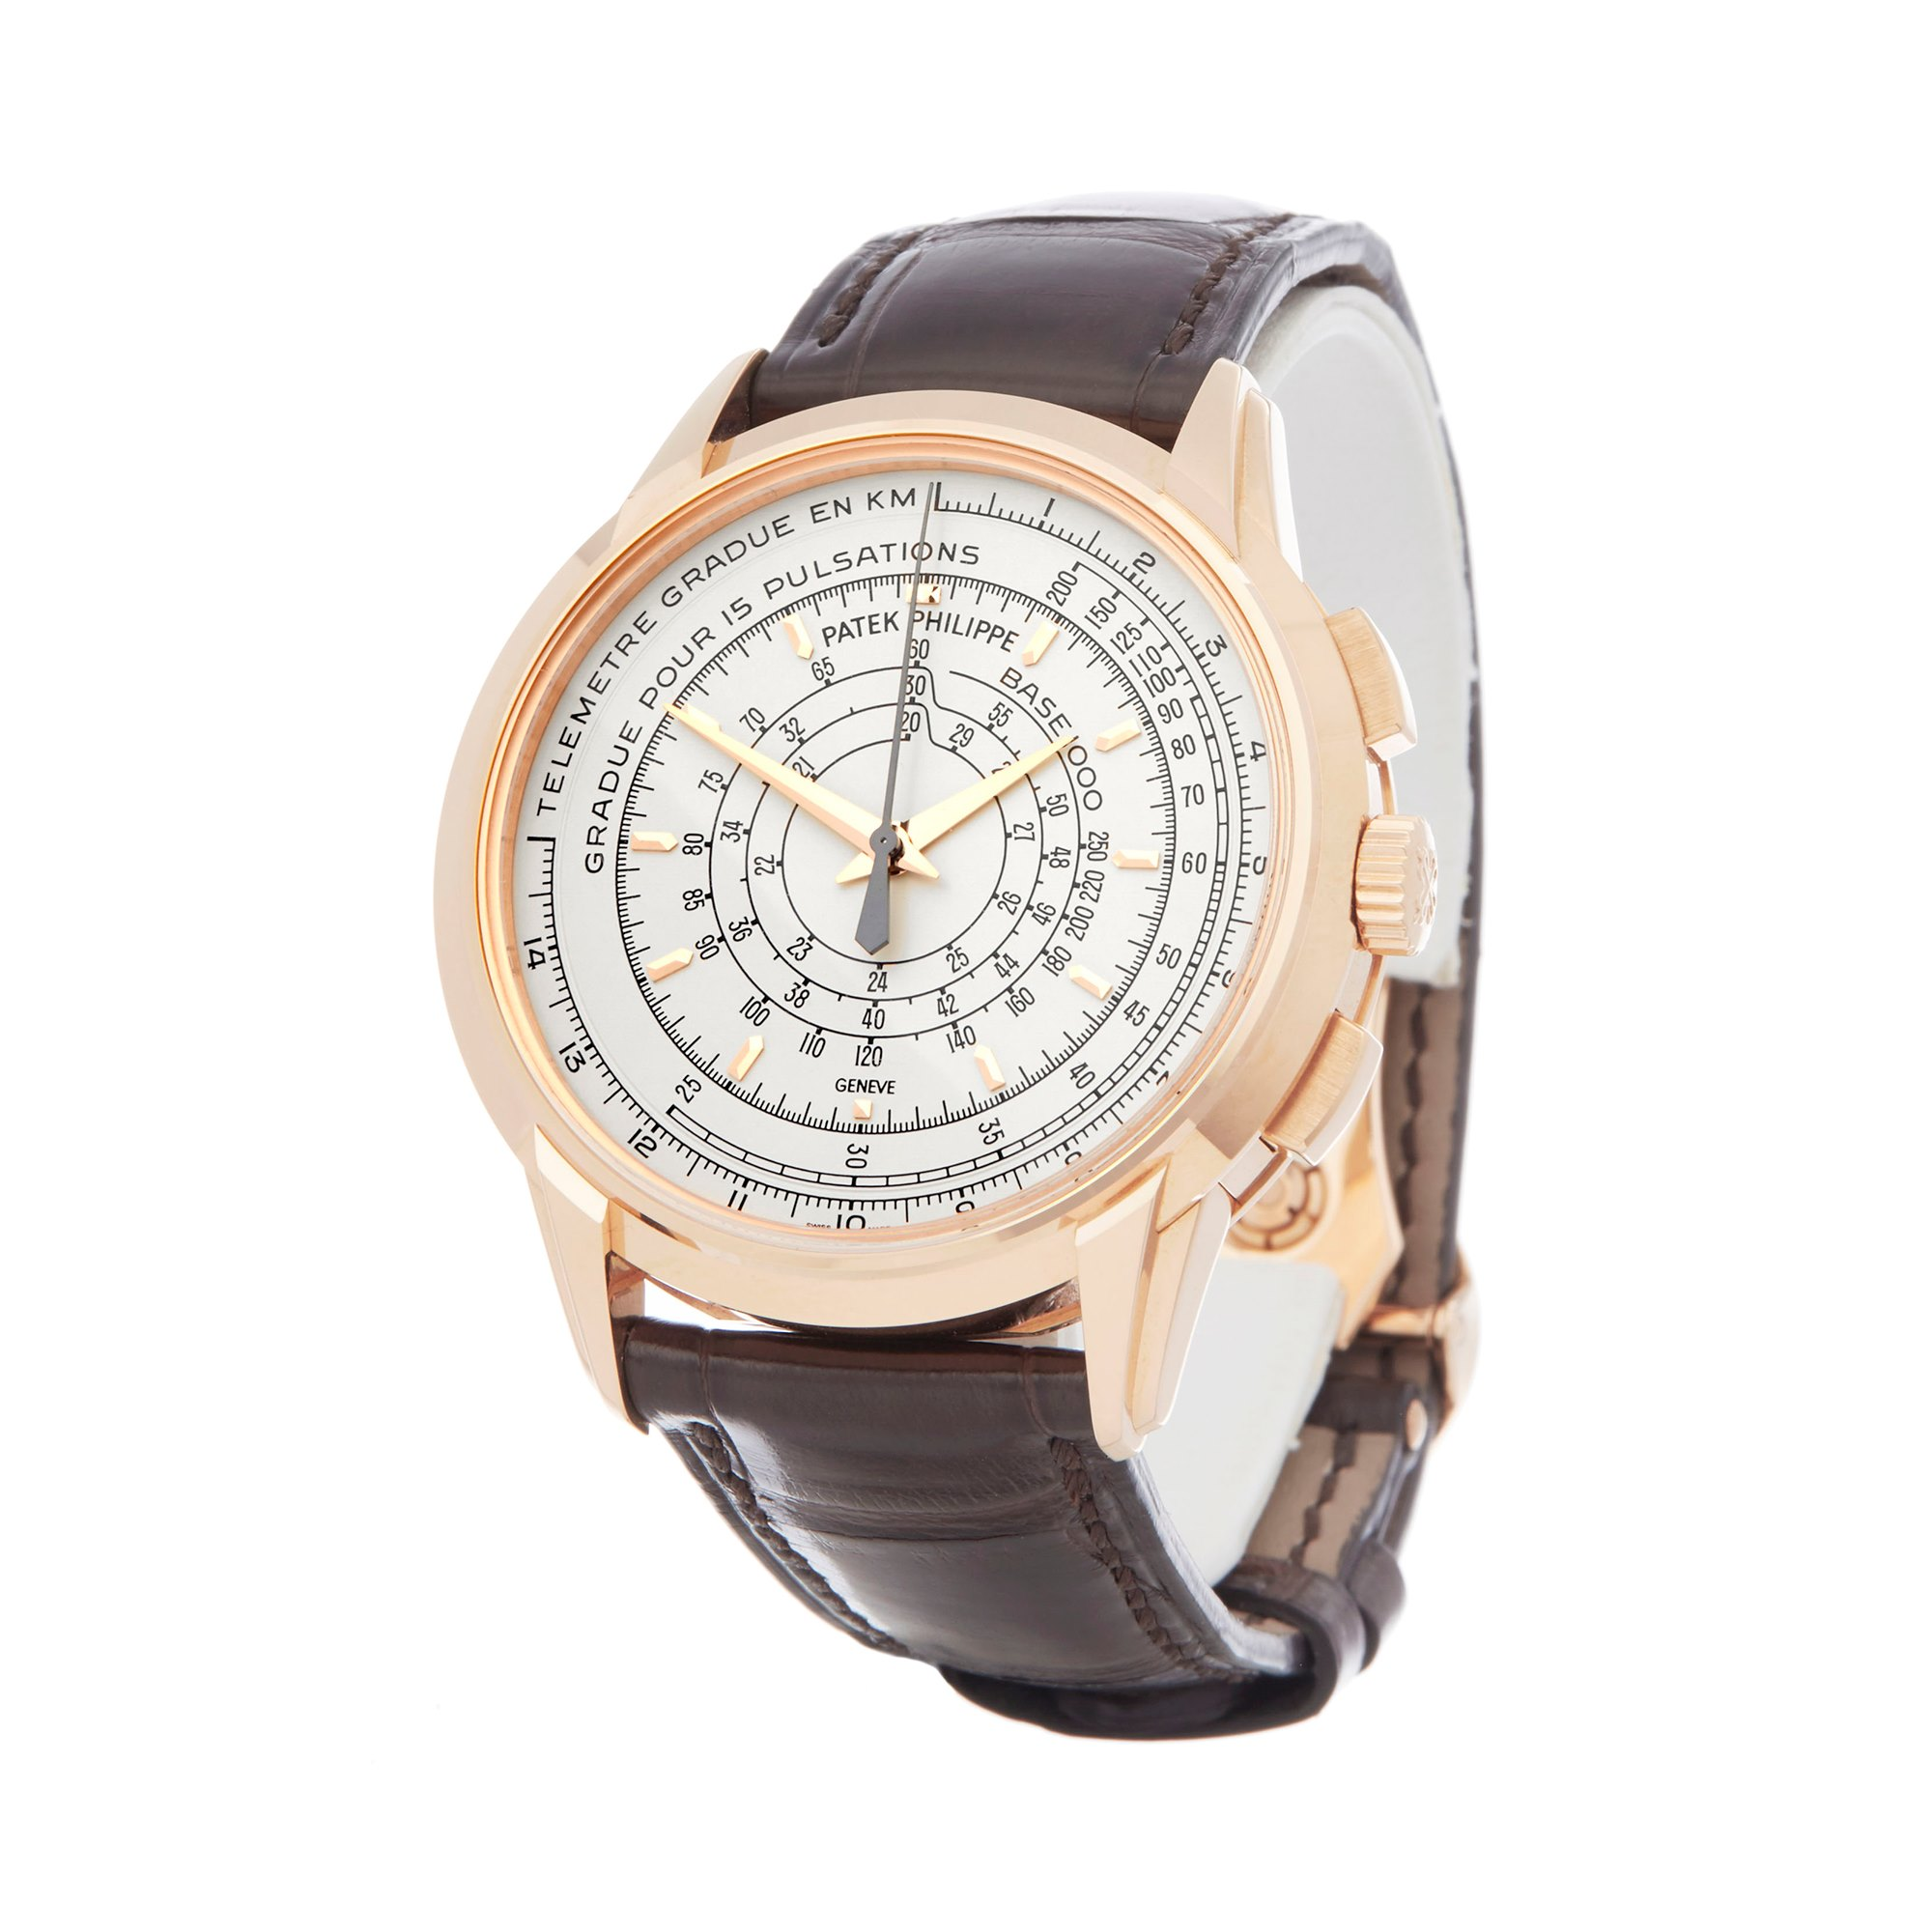 Patek Philippe Multi-Scale Chronograph Eric Clapton's 175th Anniversary Watch 18k Rose Gold 5975R-001